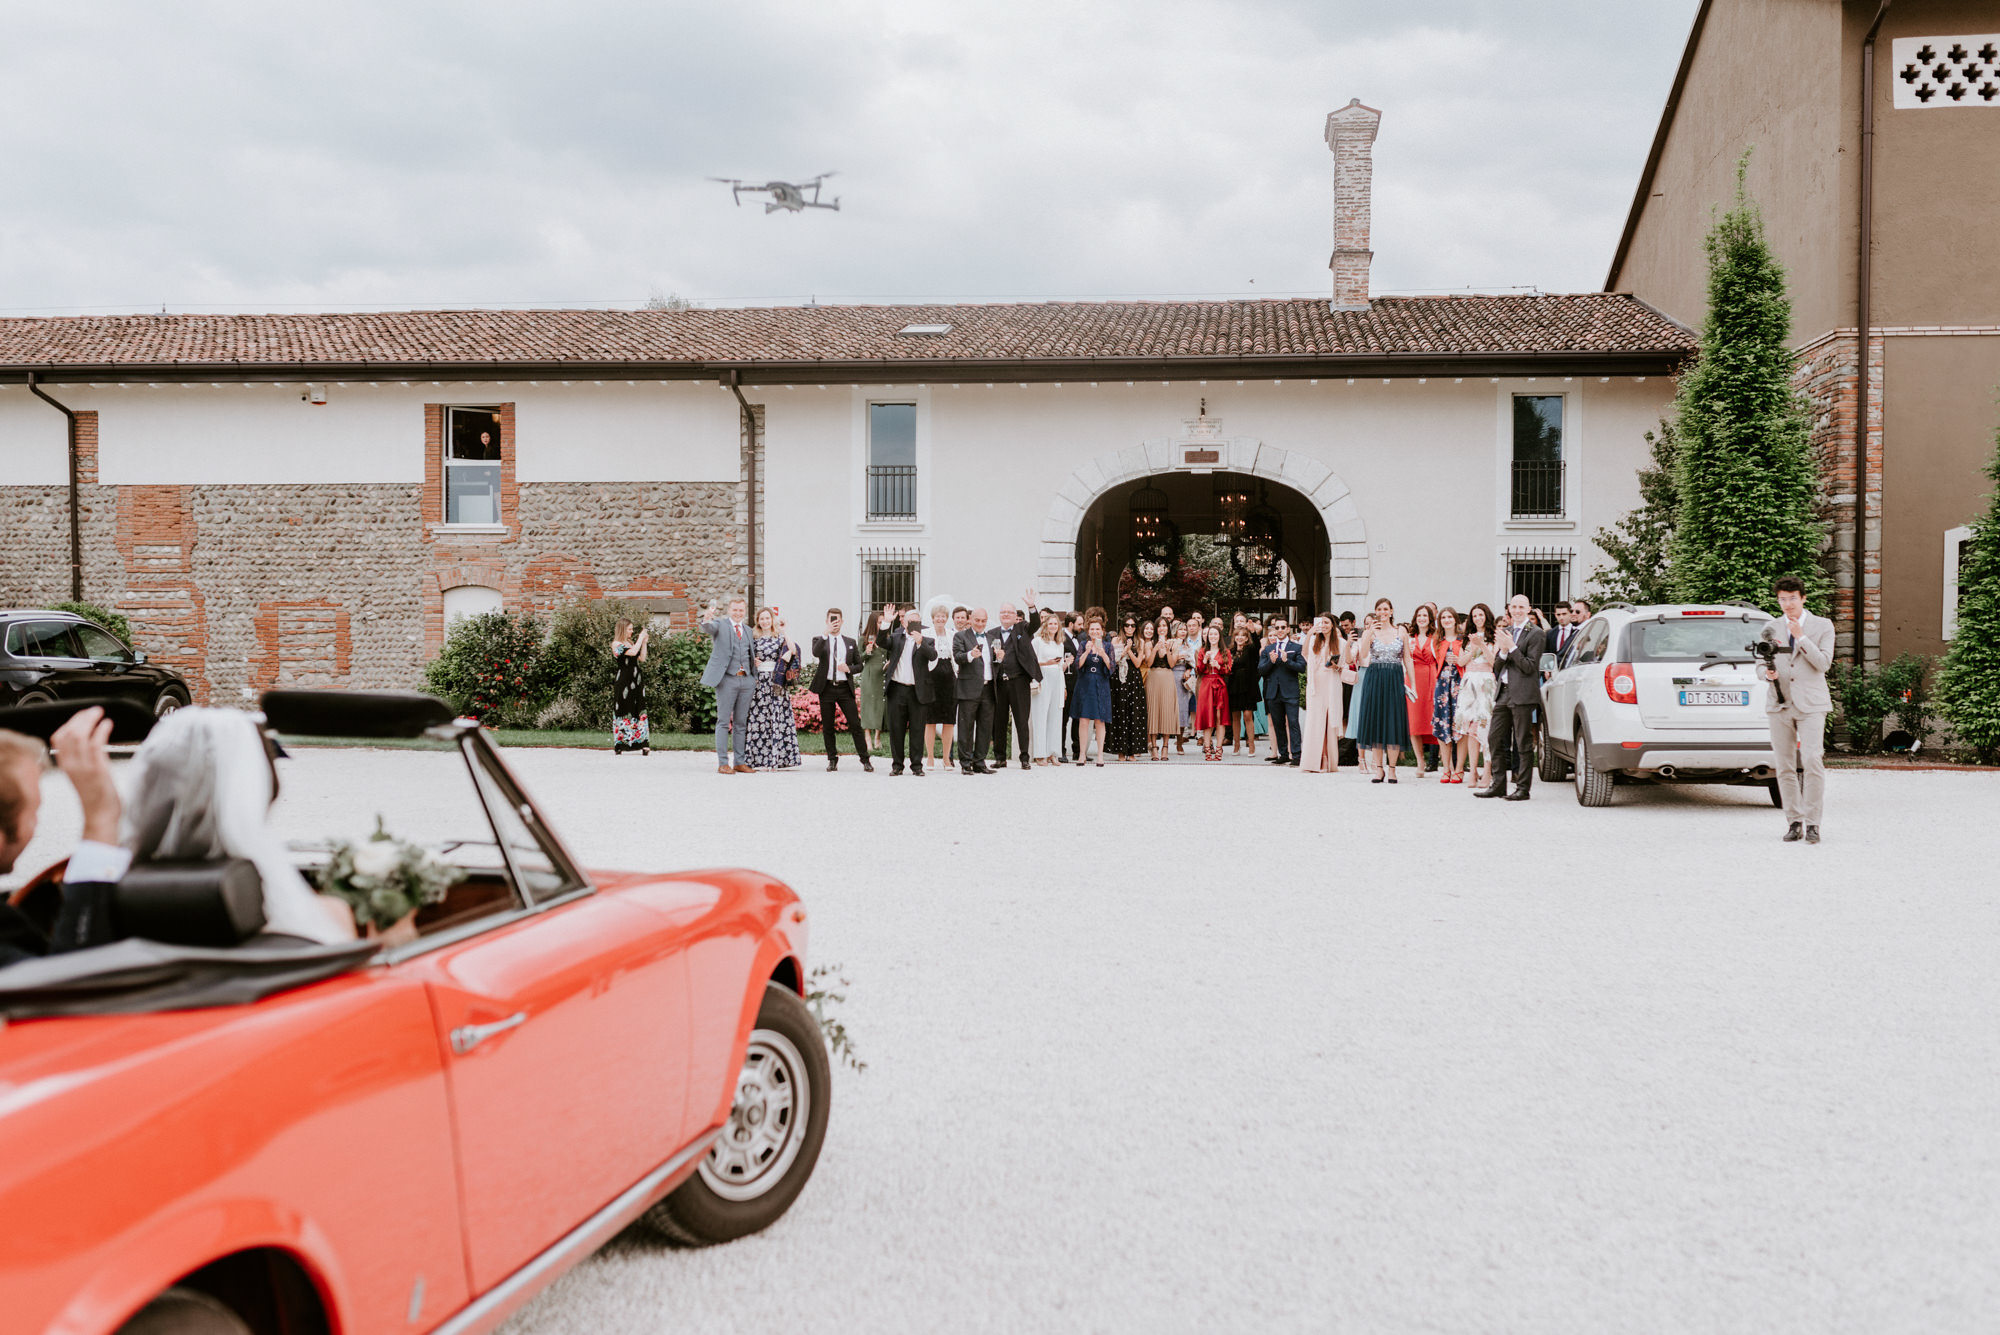 FOTO+PHOTO+BODA+WEDDING+ITALIA+ITALY+MAURICIO+GARAY+MAURICIOGARAY+WEDDINPHOTOGRAPHER+FOTOGRAFODEBODA-1364.jpg